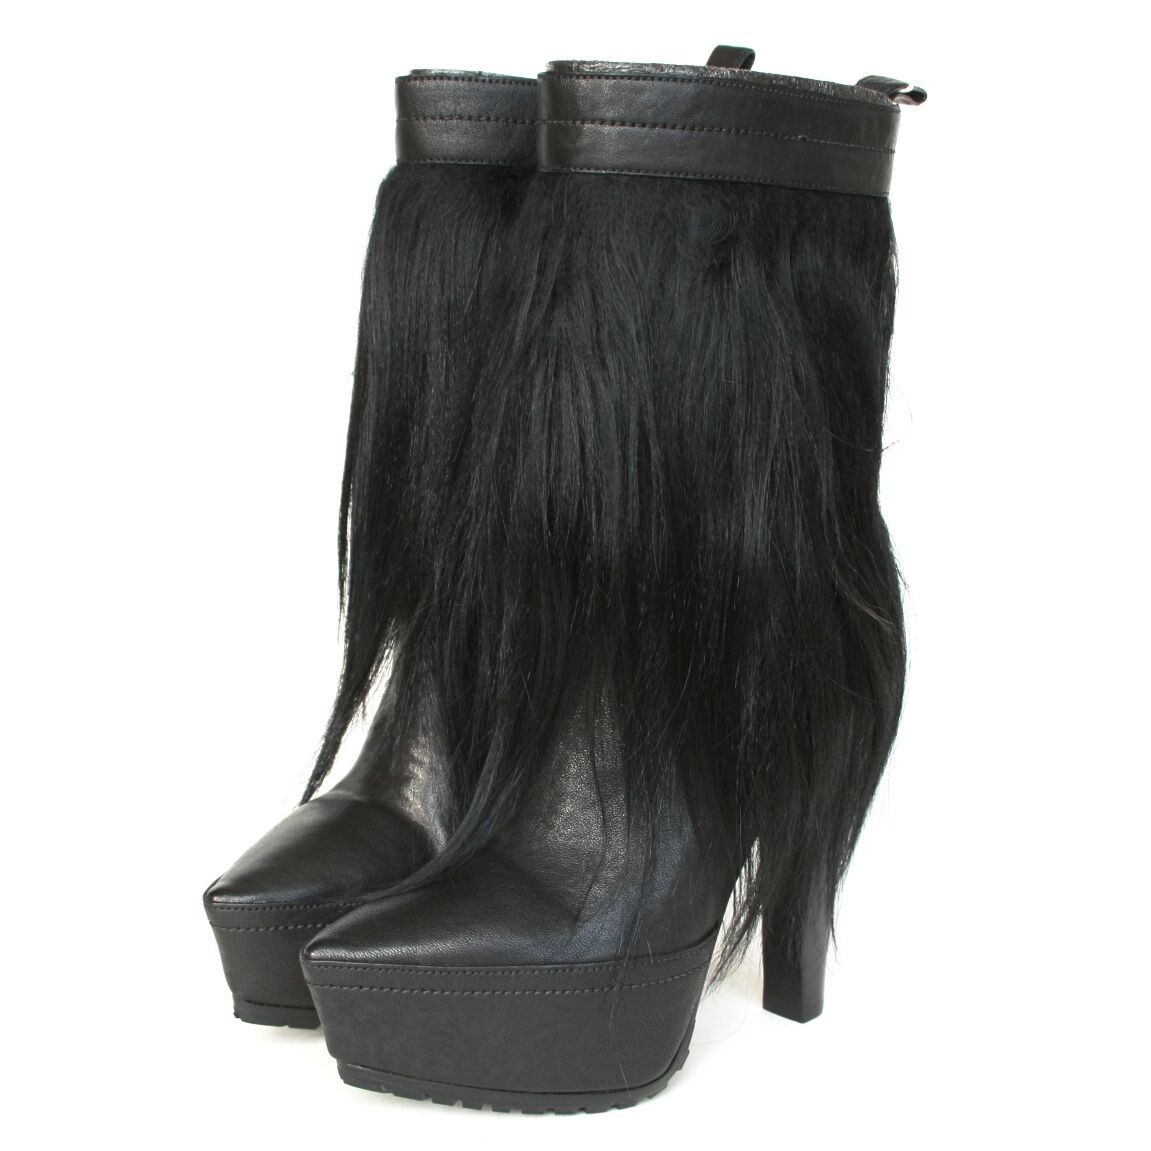 sconto online di vendita ALEXANDER WANG  925 nero goat goat goat fur pointed toe platform Polina stivali 35-IT 5 NEW  comprare a buon mercato